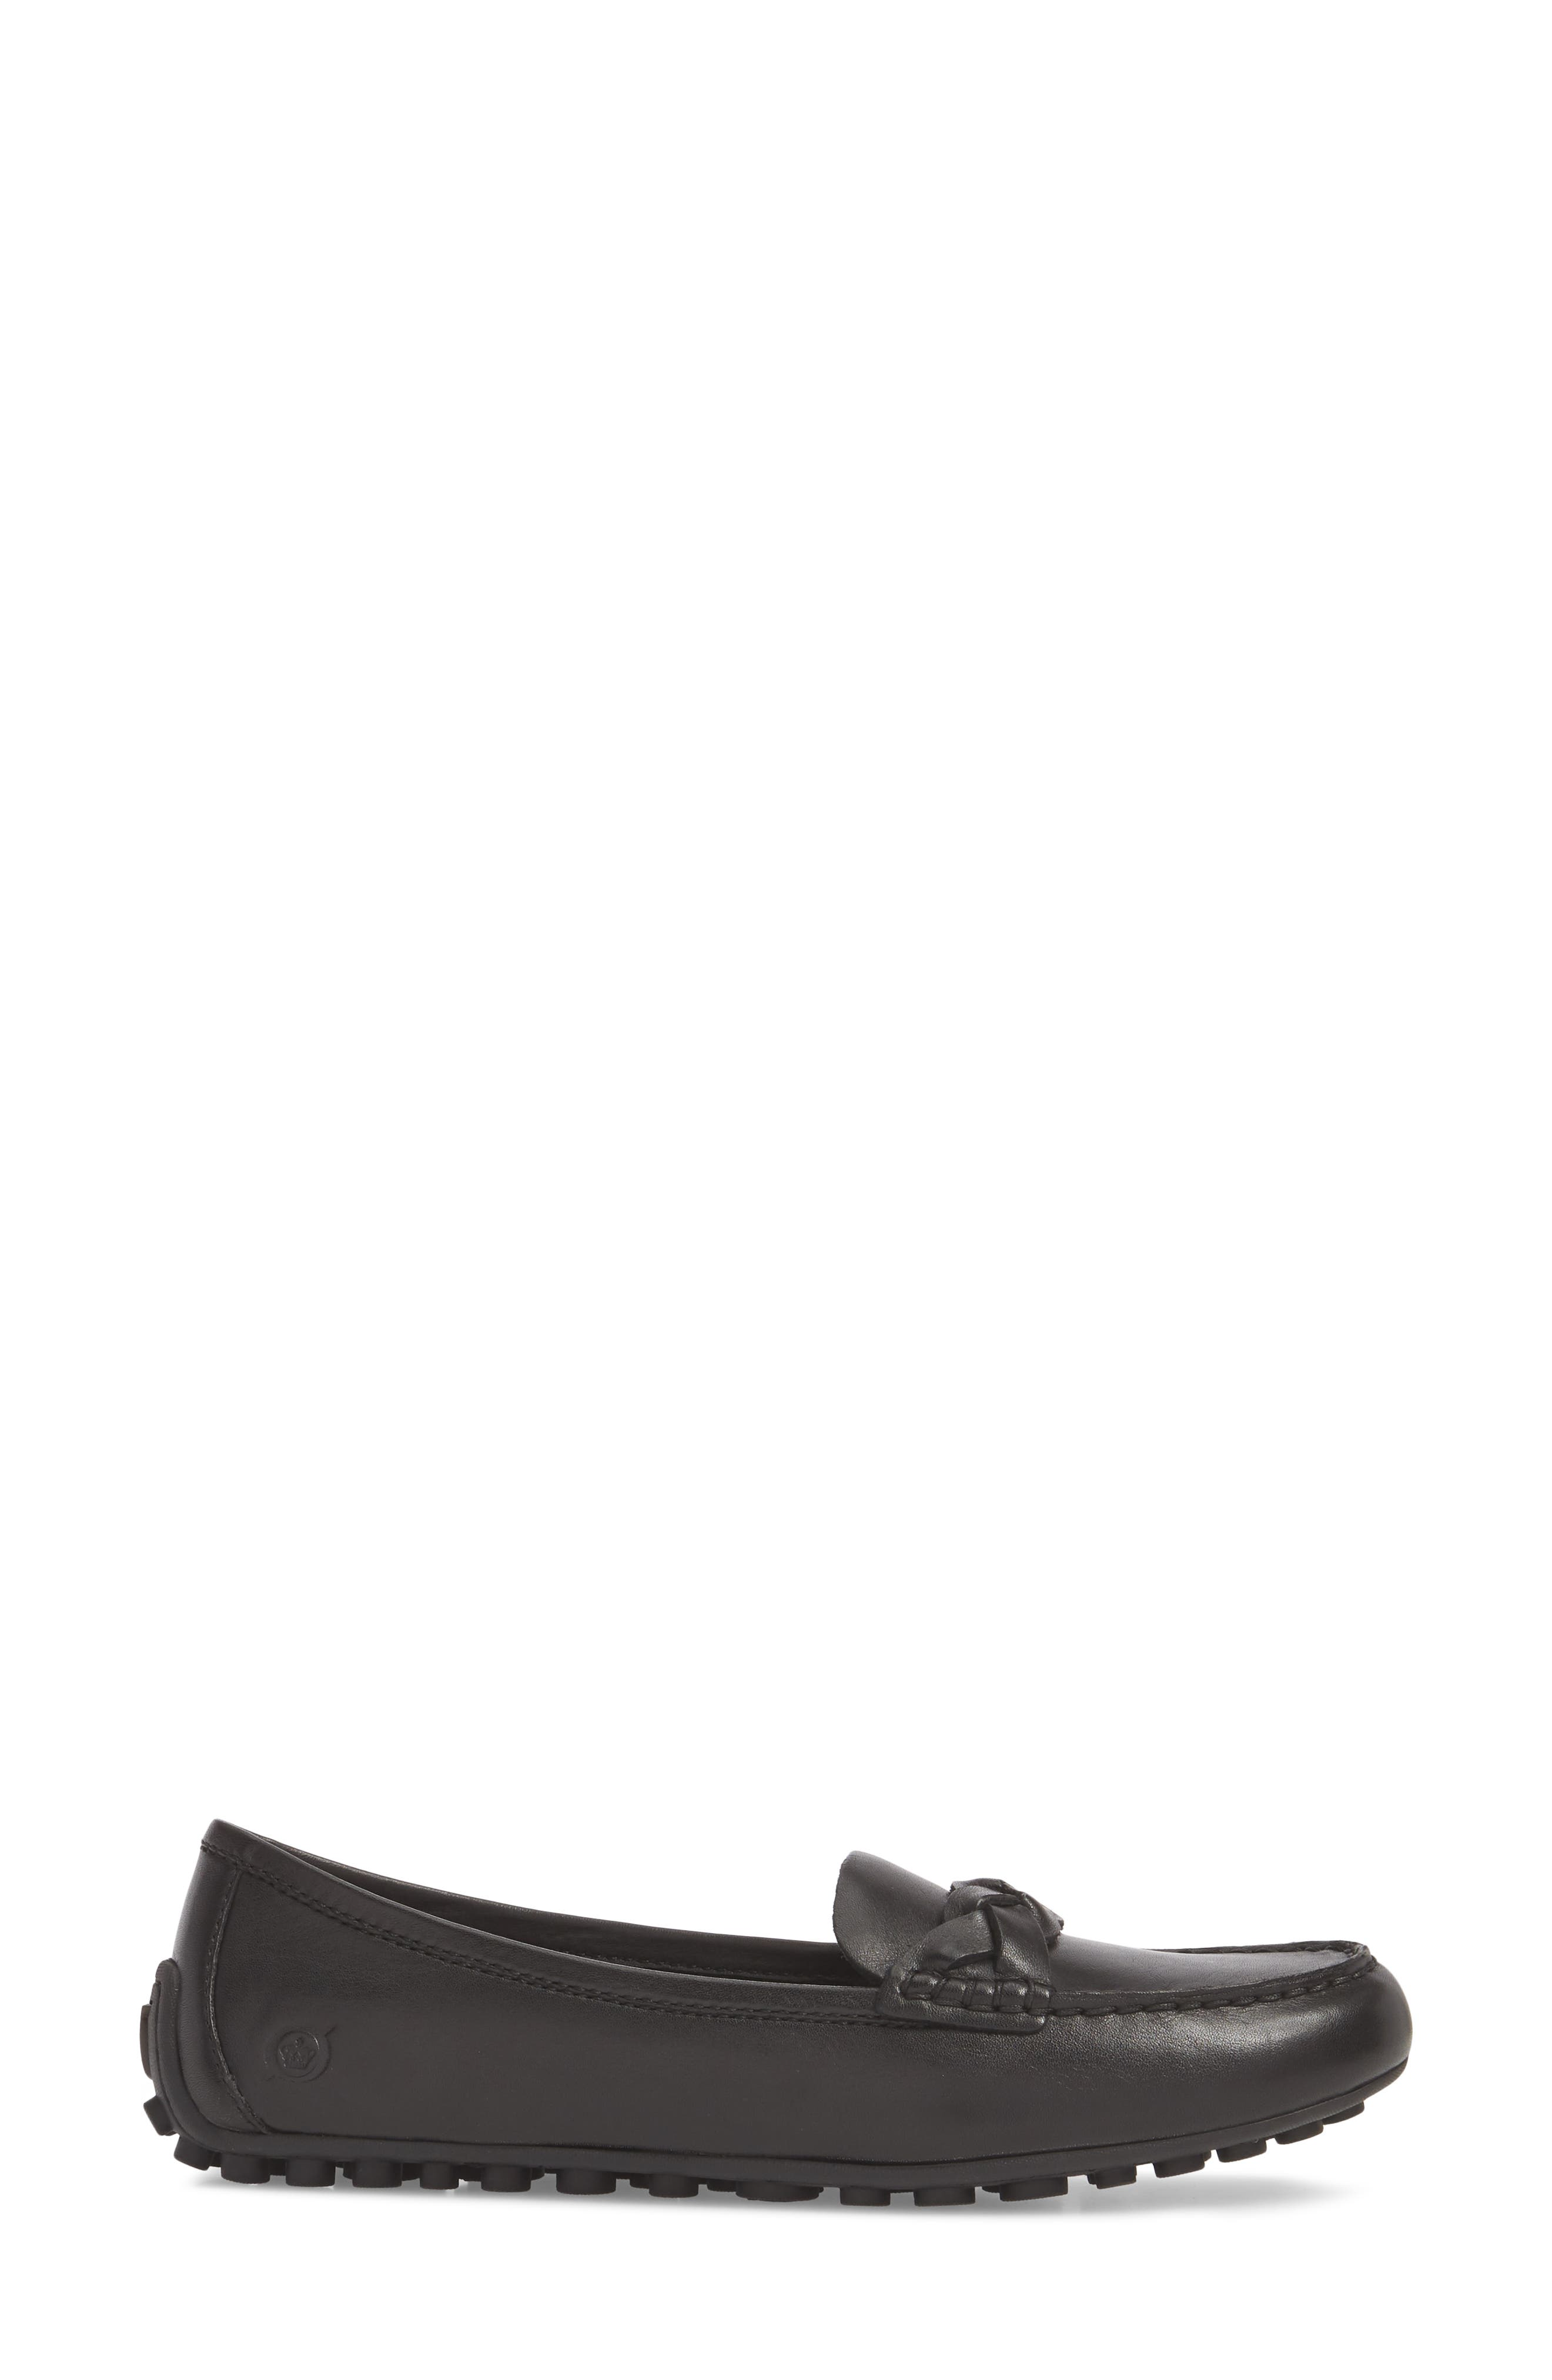 Kasa Loafer,                             Alternate thumbnail 3, color,                             Black Leather